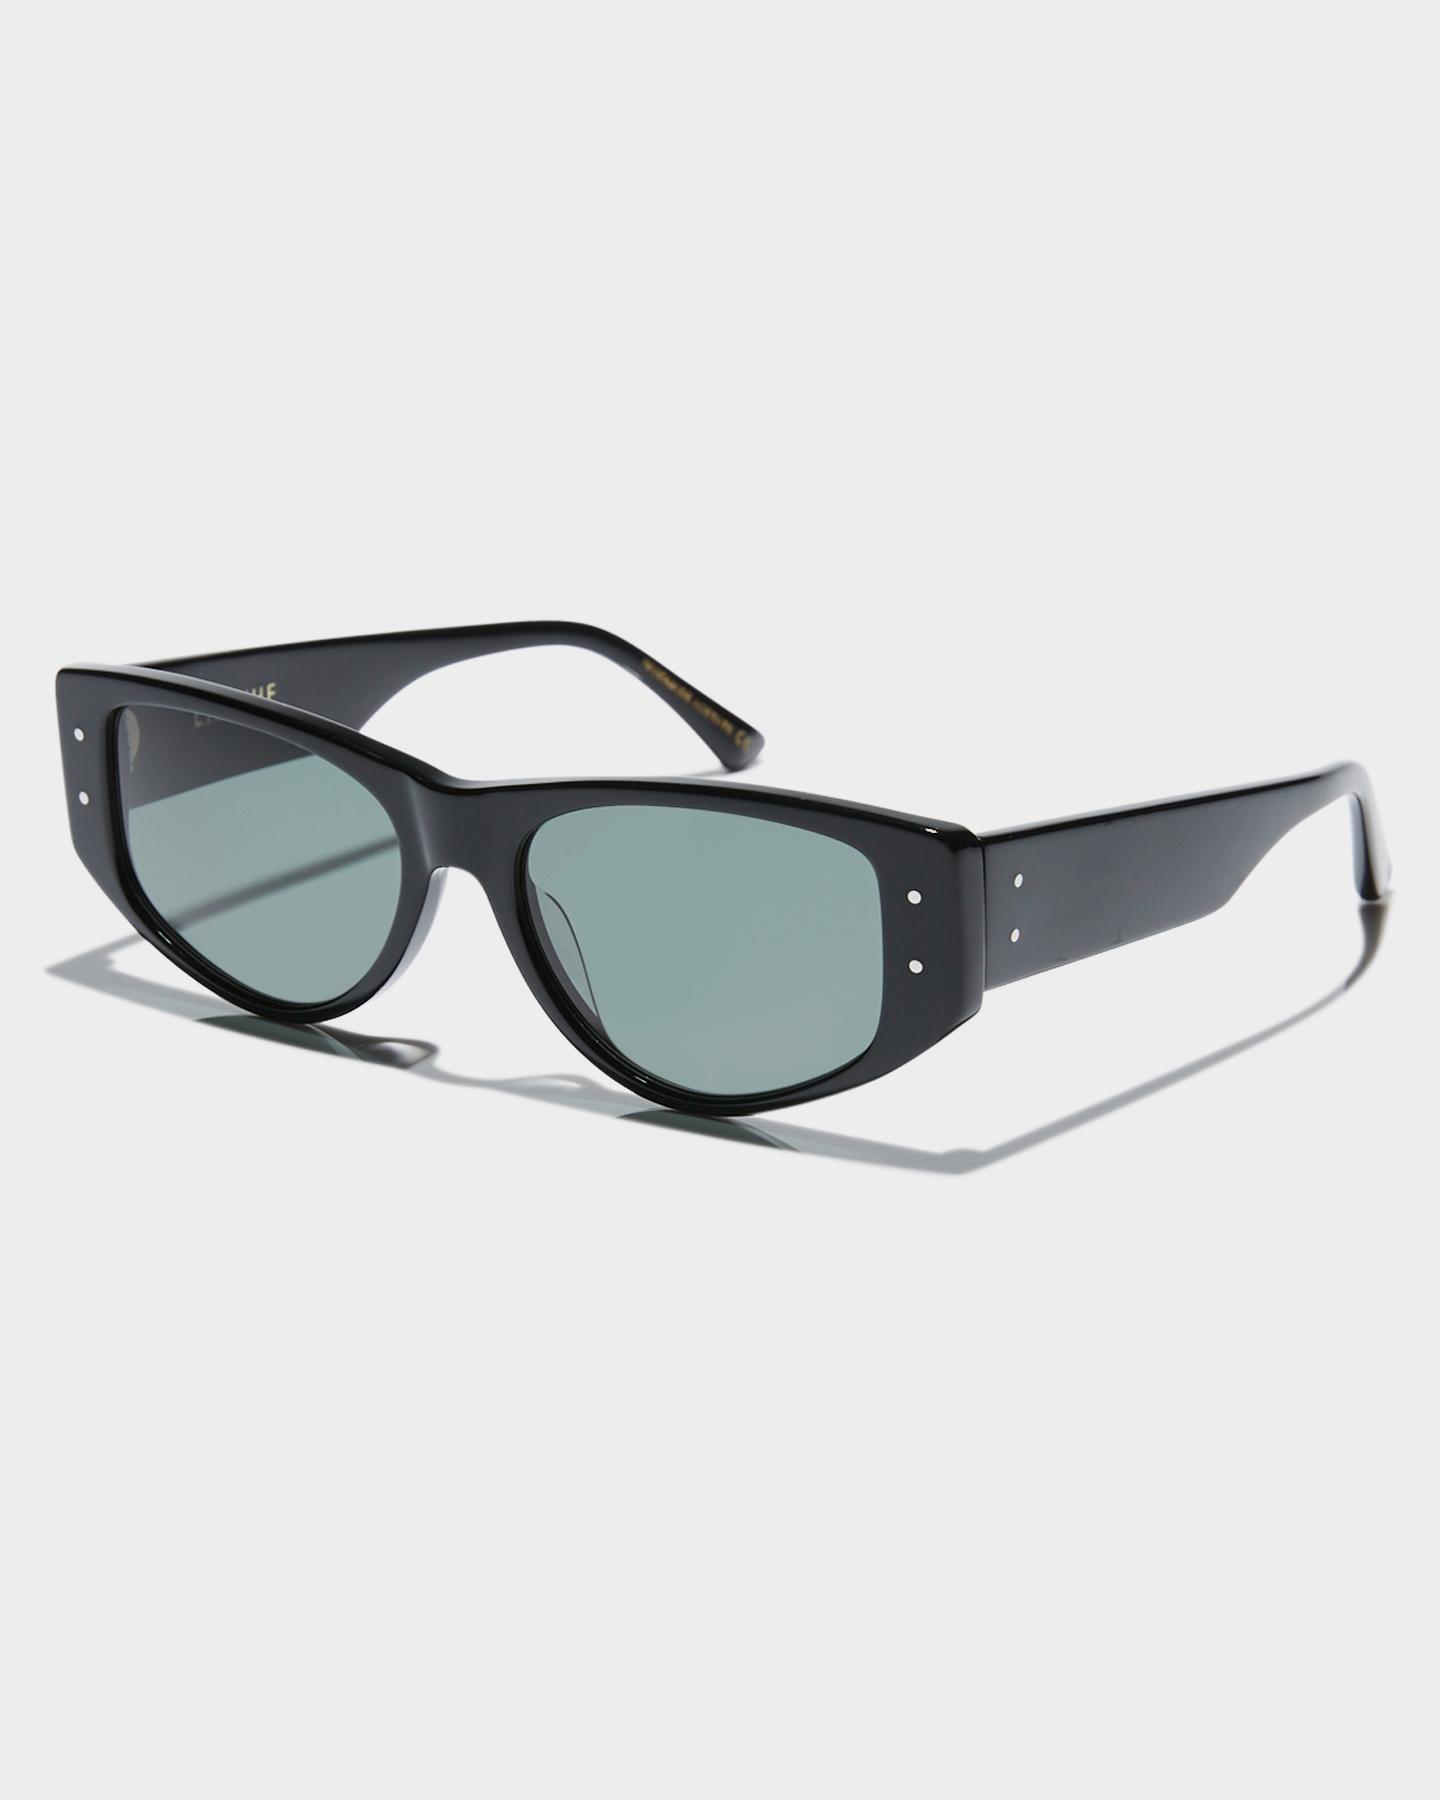 Epokhe Eno Sunglasses Black Polished Green